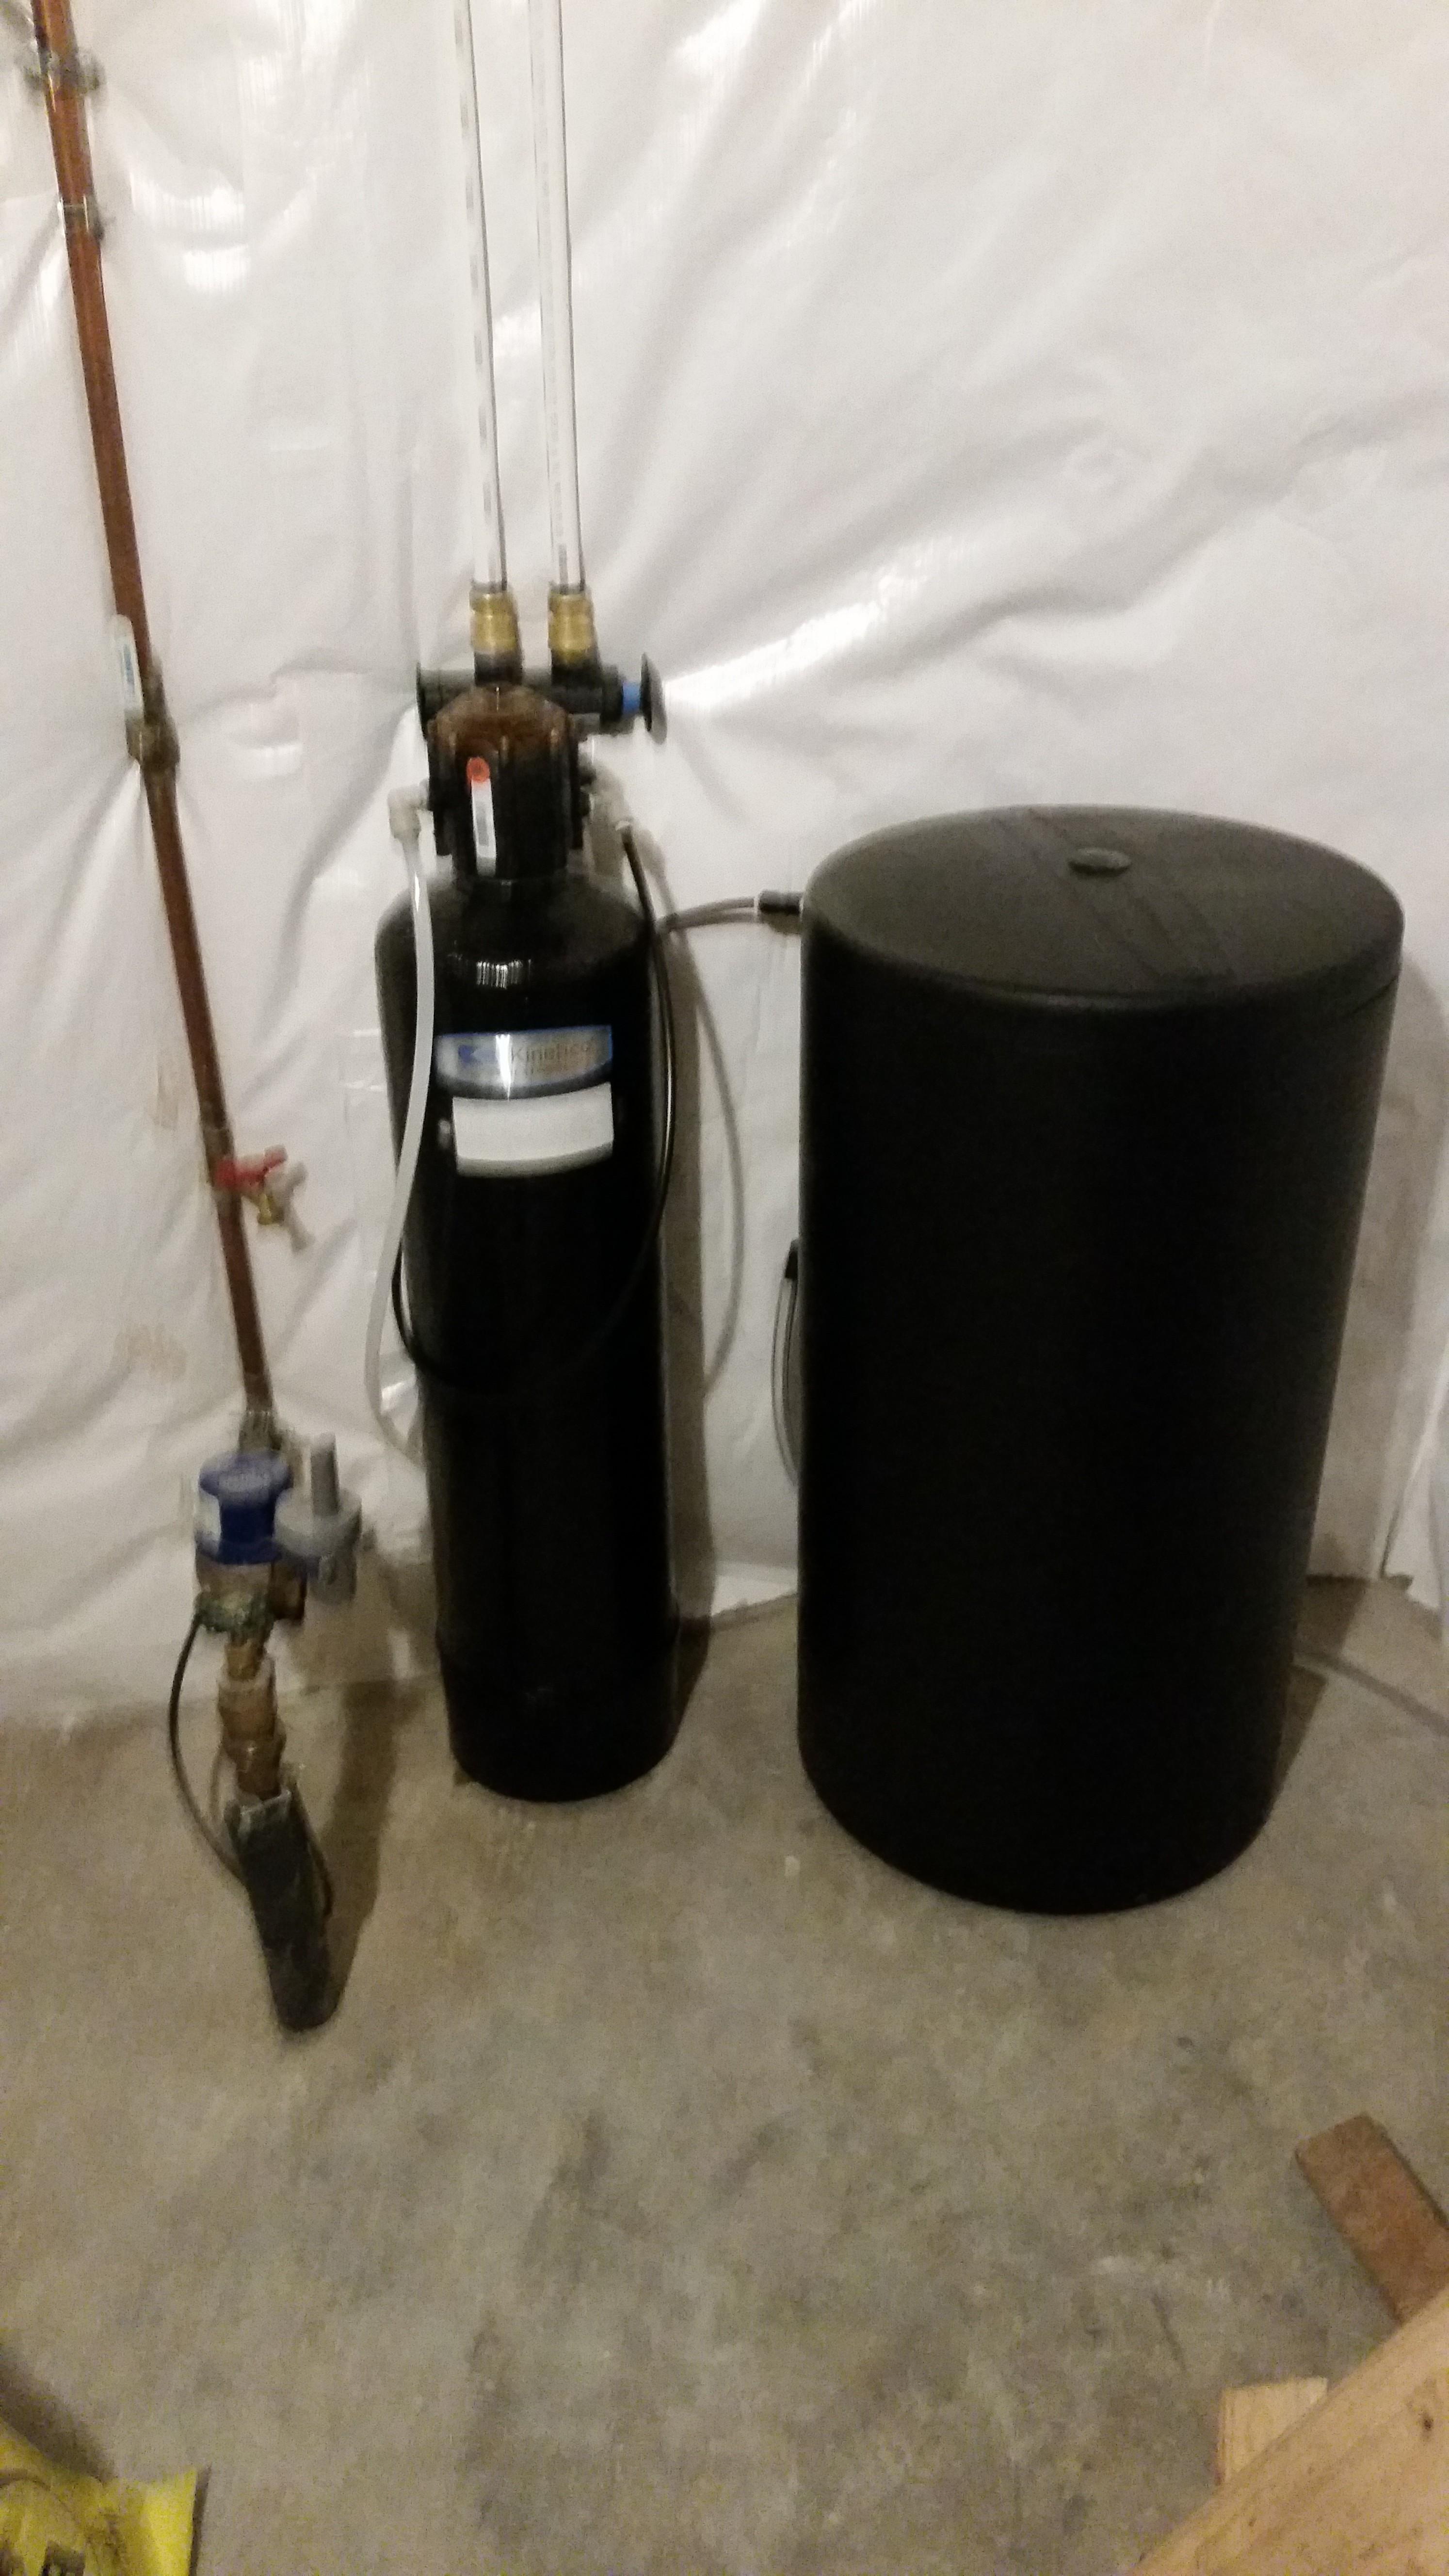 Kinetico water softener installed in Bettendorf, Iowa